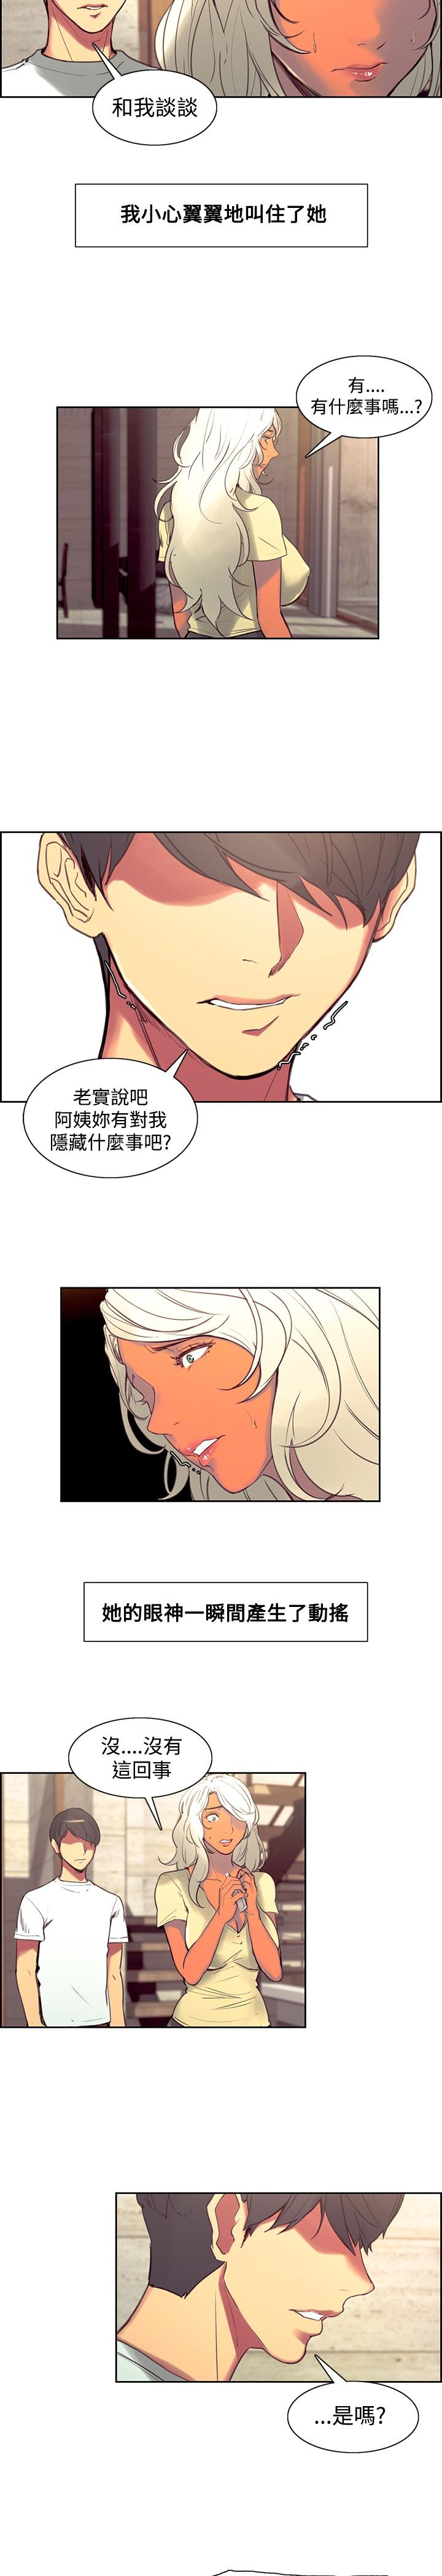 Domesticate the Housekeeper 调教家政妇 Ch.29~39 148